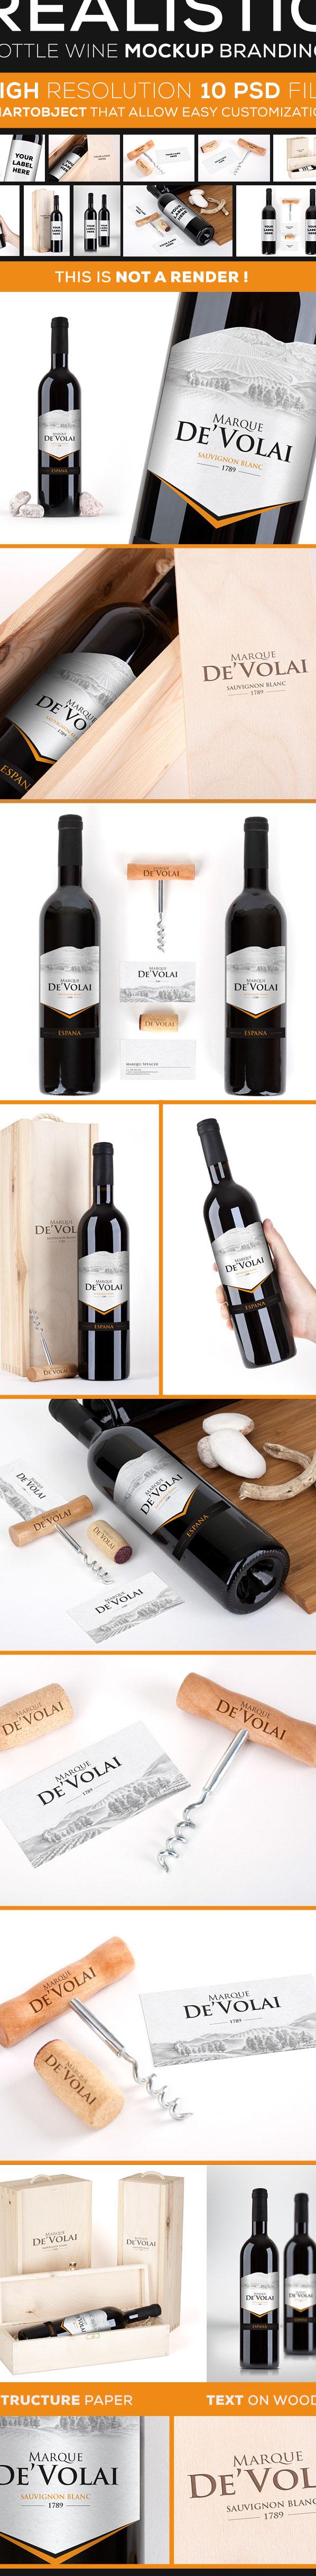 wine brand Label grapes Mockup mock up realistic psd file